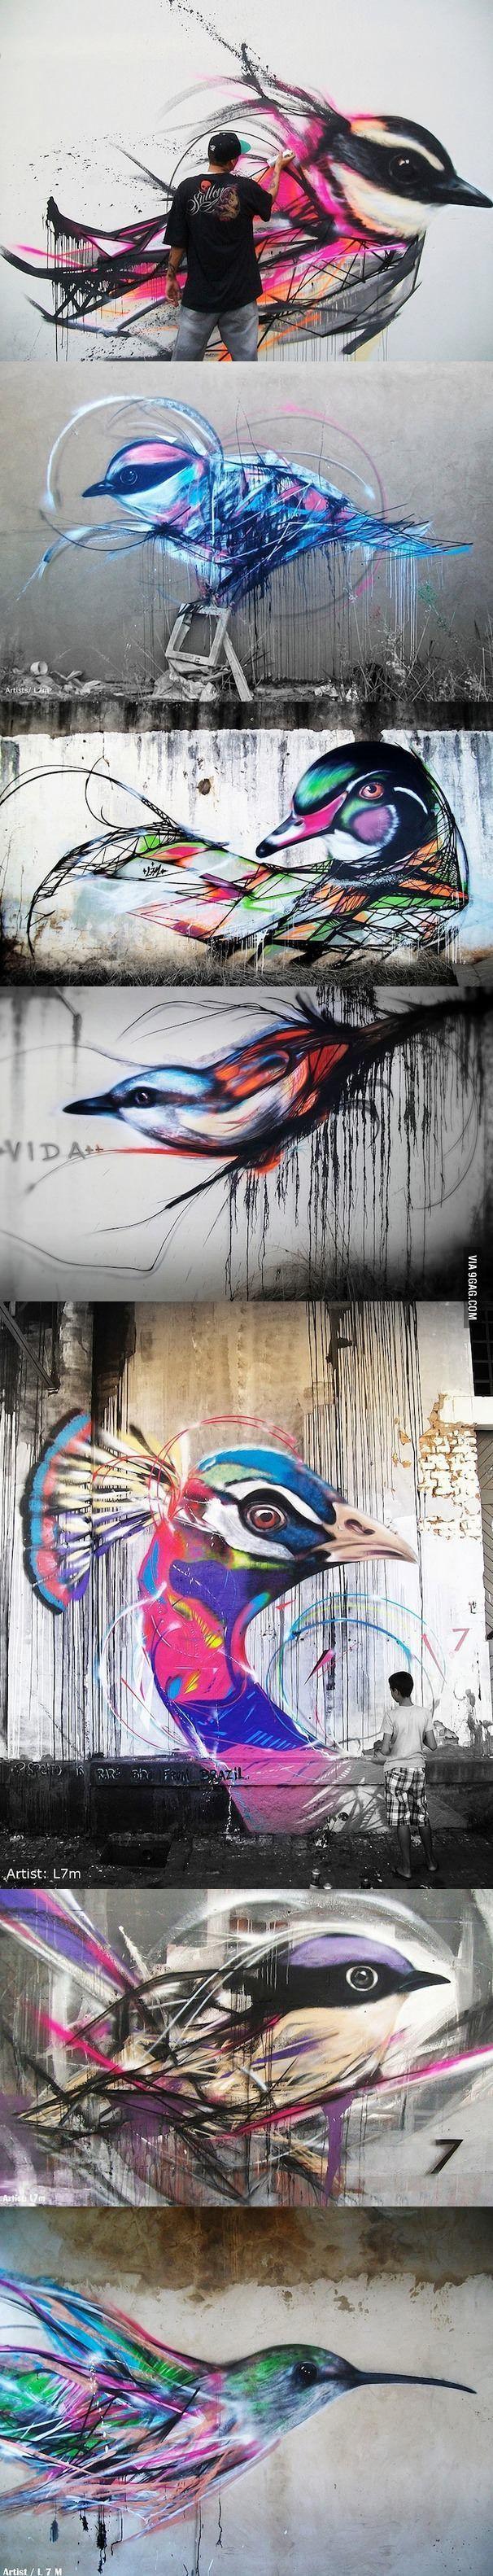 Bird art 8 street art. Beautiful street art photography. How cool are these!!